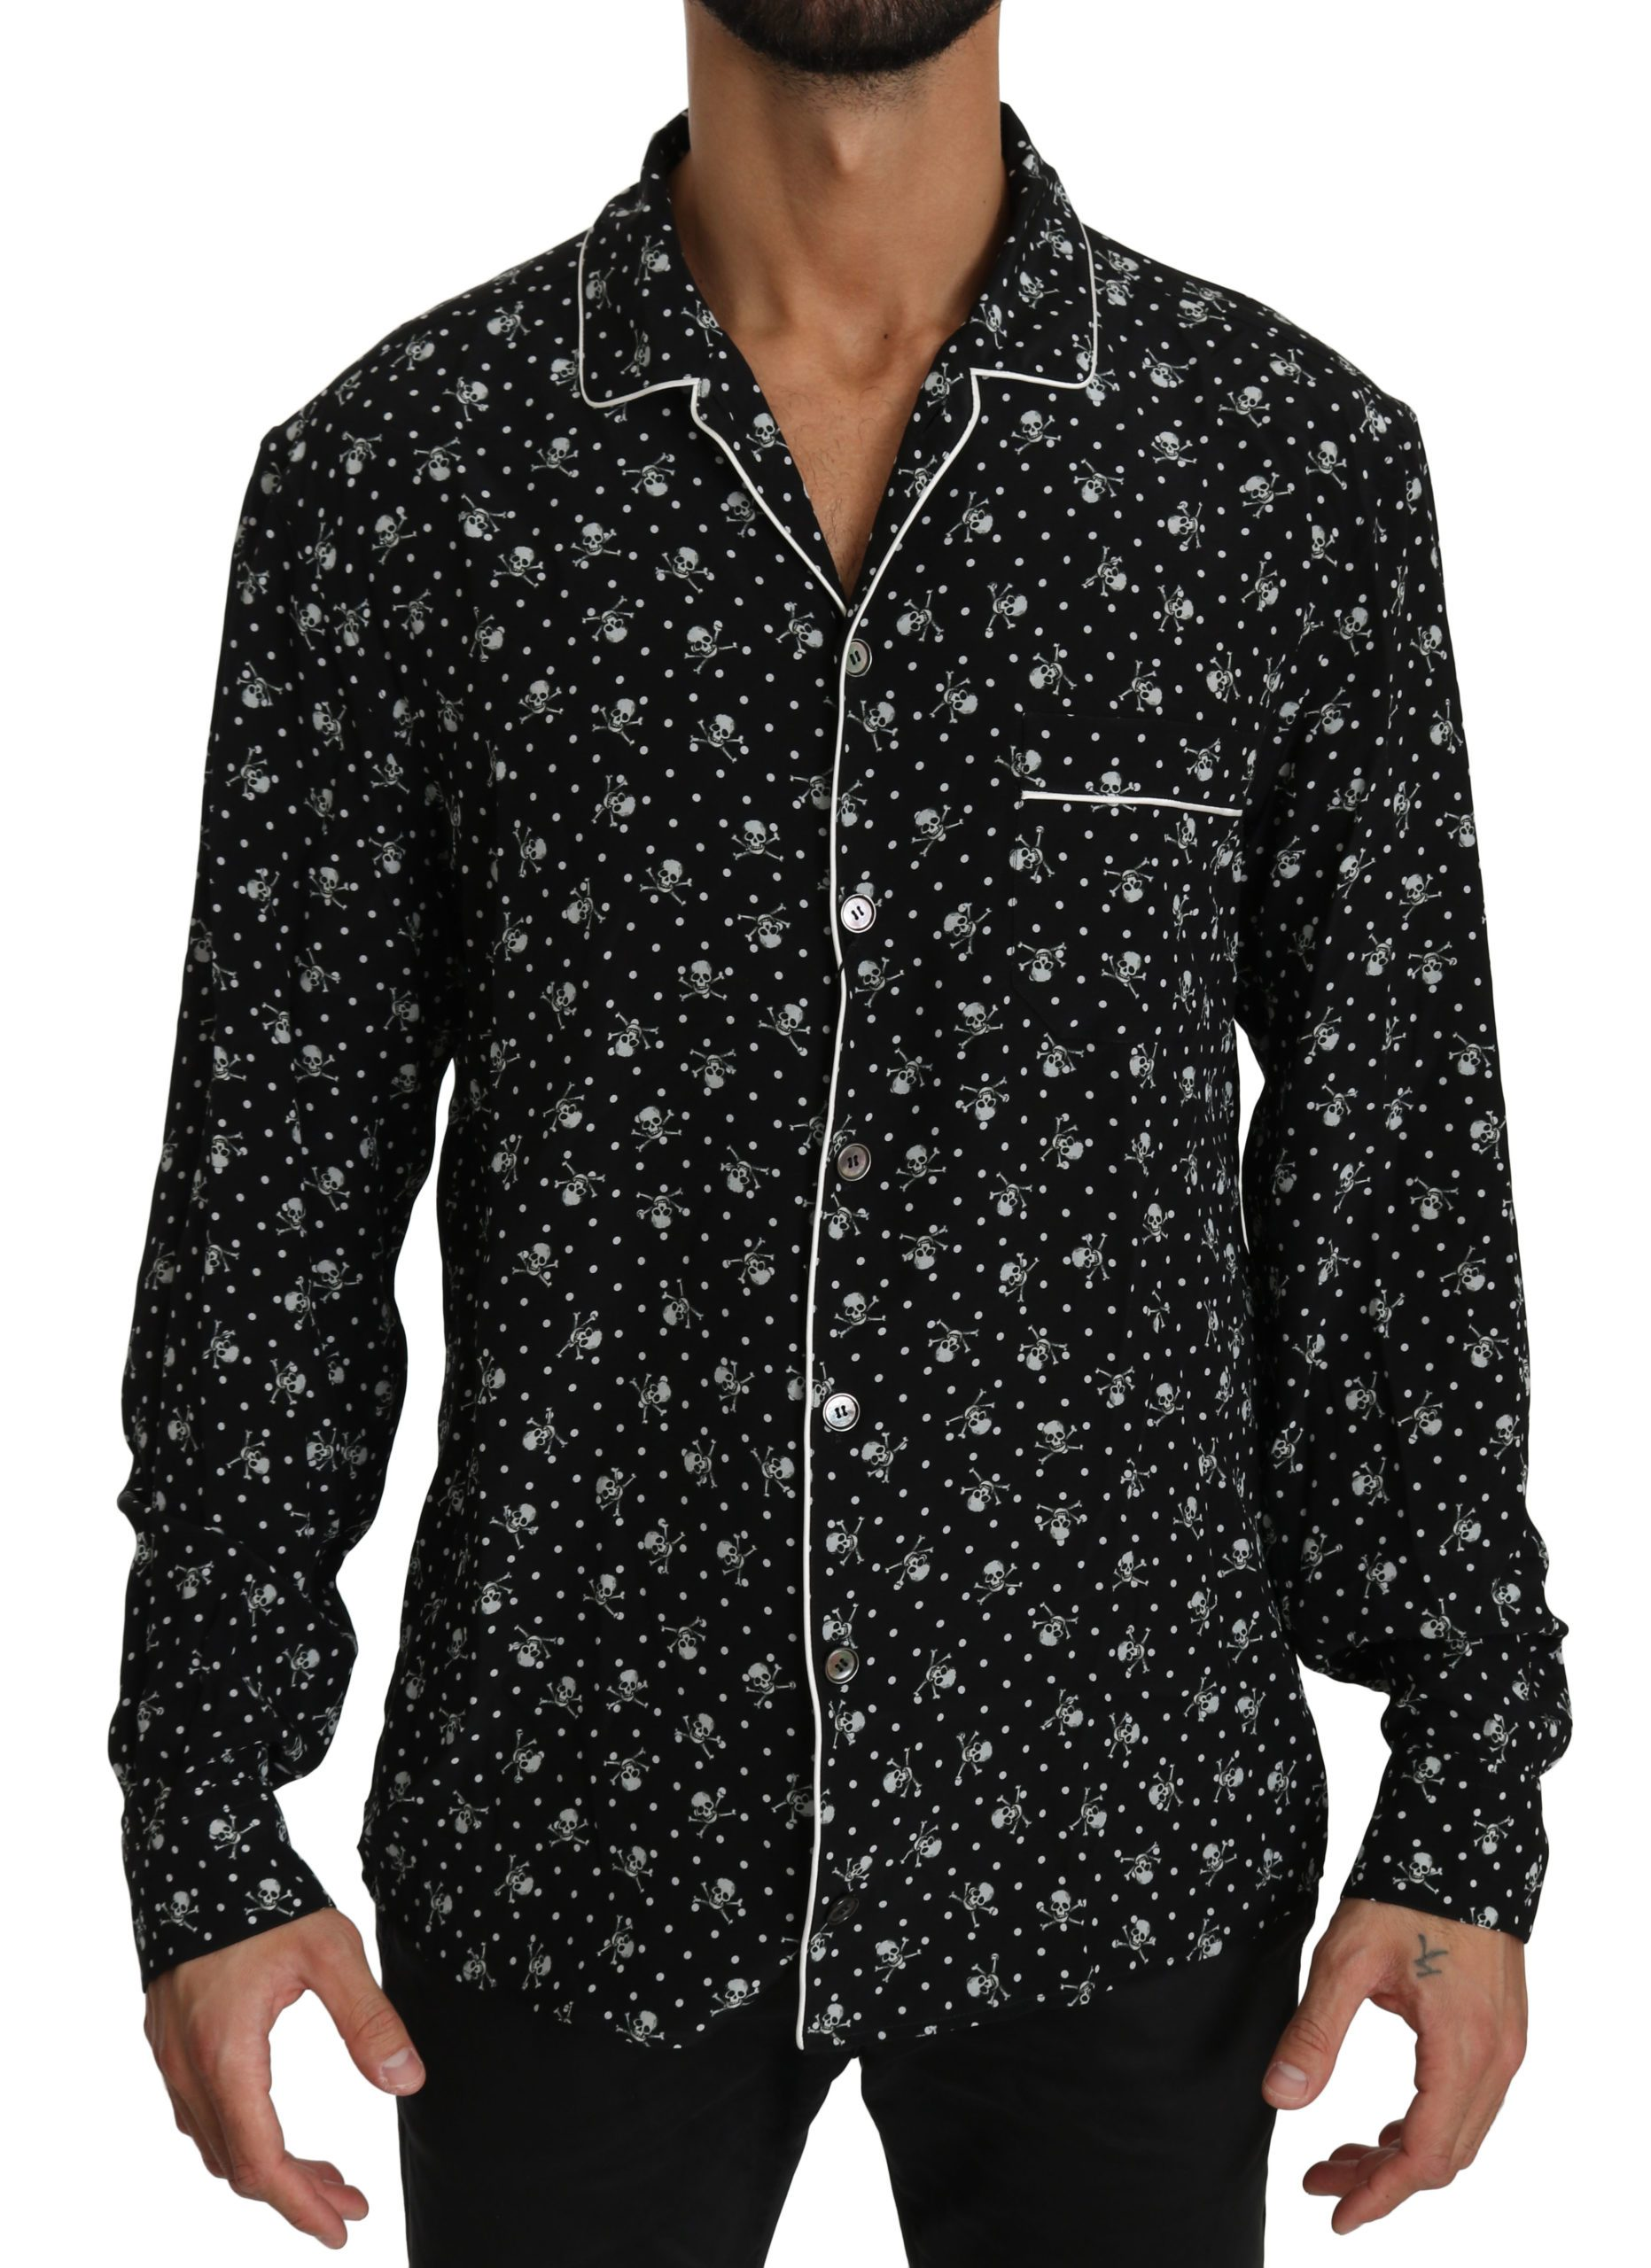 Dolce & Gabbana Men's Skull Print Silk Sleepwear Shirt Black TSH4013 - IT39   S